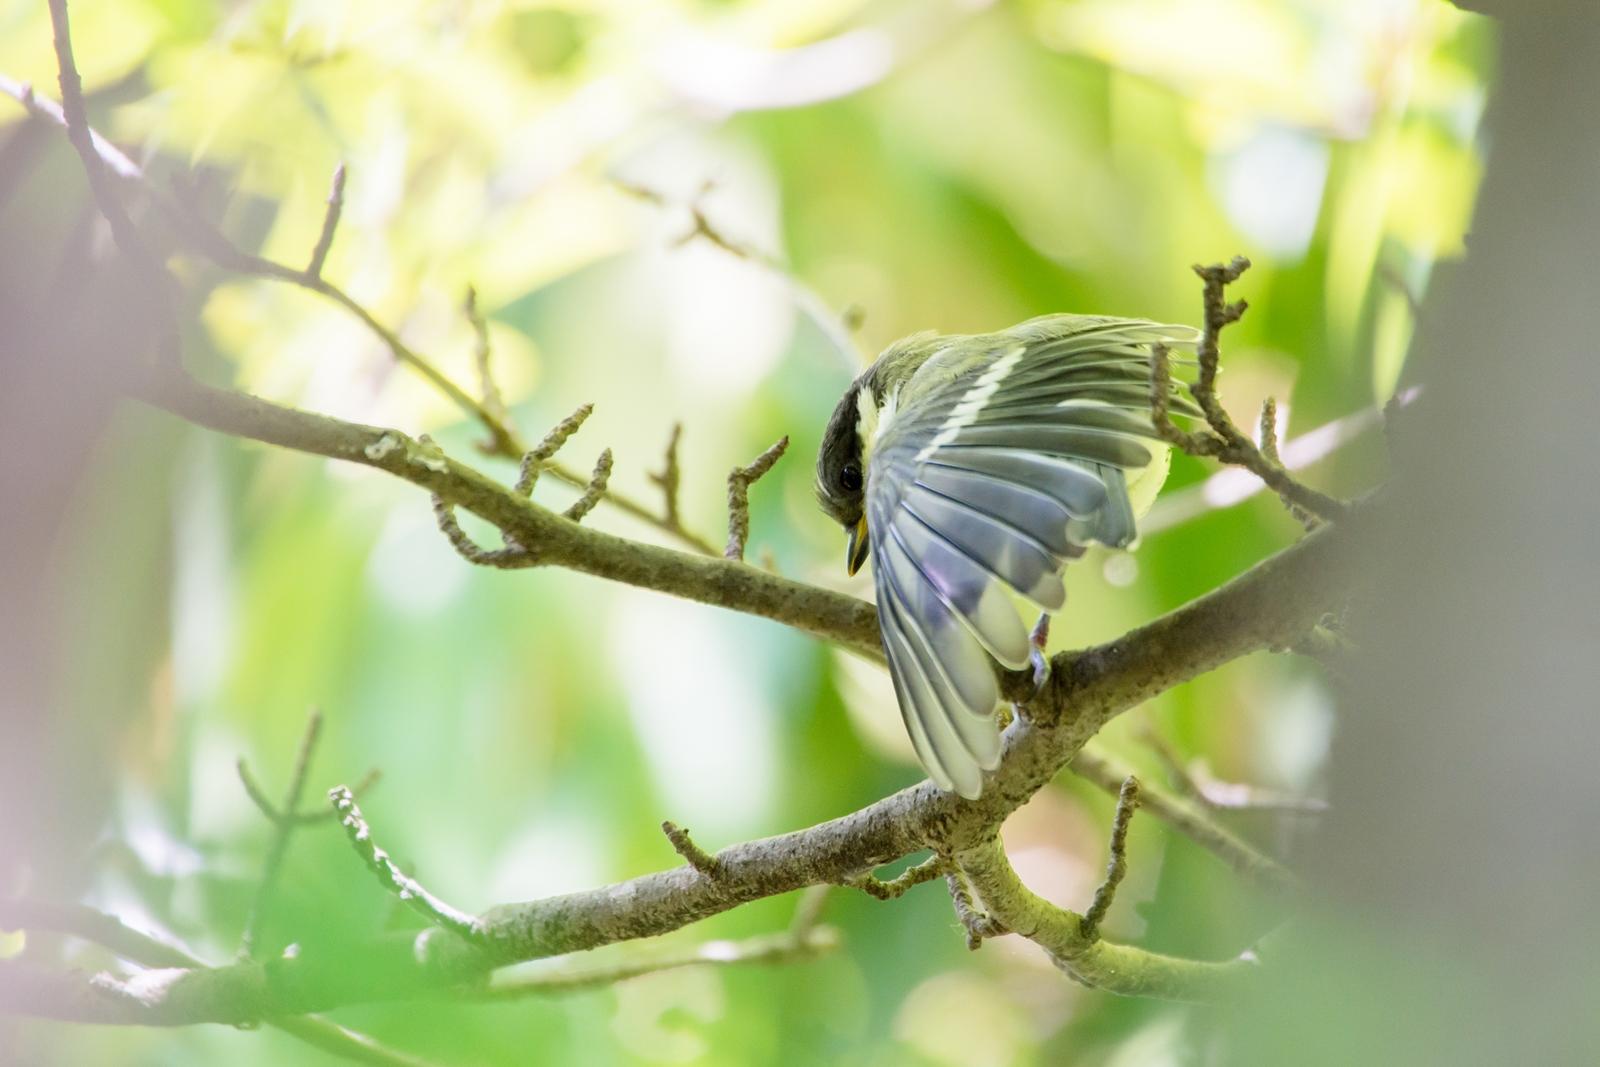 Photo: 希望の羽 Feather of Hope.  巣立ちの季節 明日へと羽ばたく新たな翼 無垢な羽に 希望をのせて  Juvenile of Japanese Tit. (シジュウカラの幼鳥)  #birdphotography #birds  #cooljapan #kawaii  #nikon #sigma  Nikon D7200 SIGMA APO 50-500mm F5-6.3 DG OS HSM  ・小鳥の詩朗読 /poetry reading https://youtu.be/gnejJmisA24?list=PL2YtHGm0-R3qVsaqvQe9OYdJFCkI98wzF